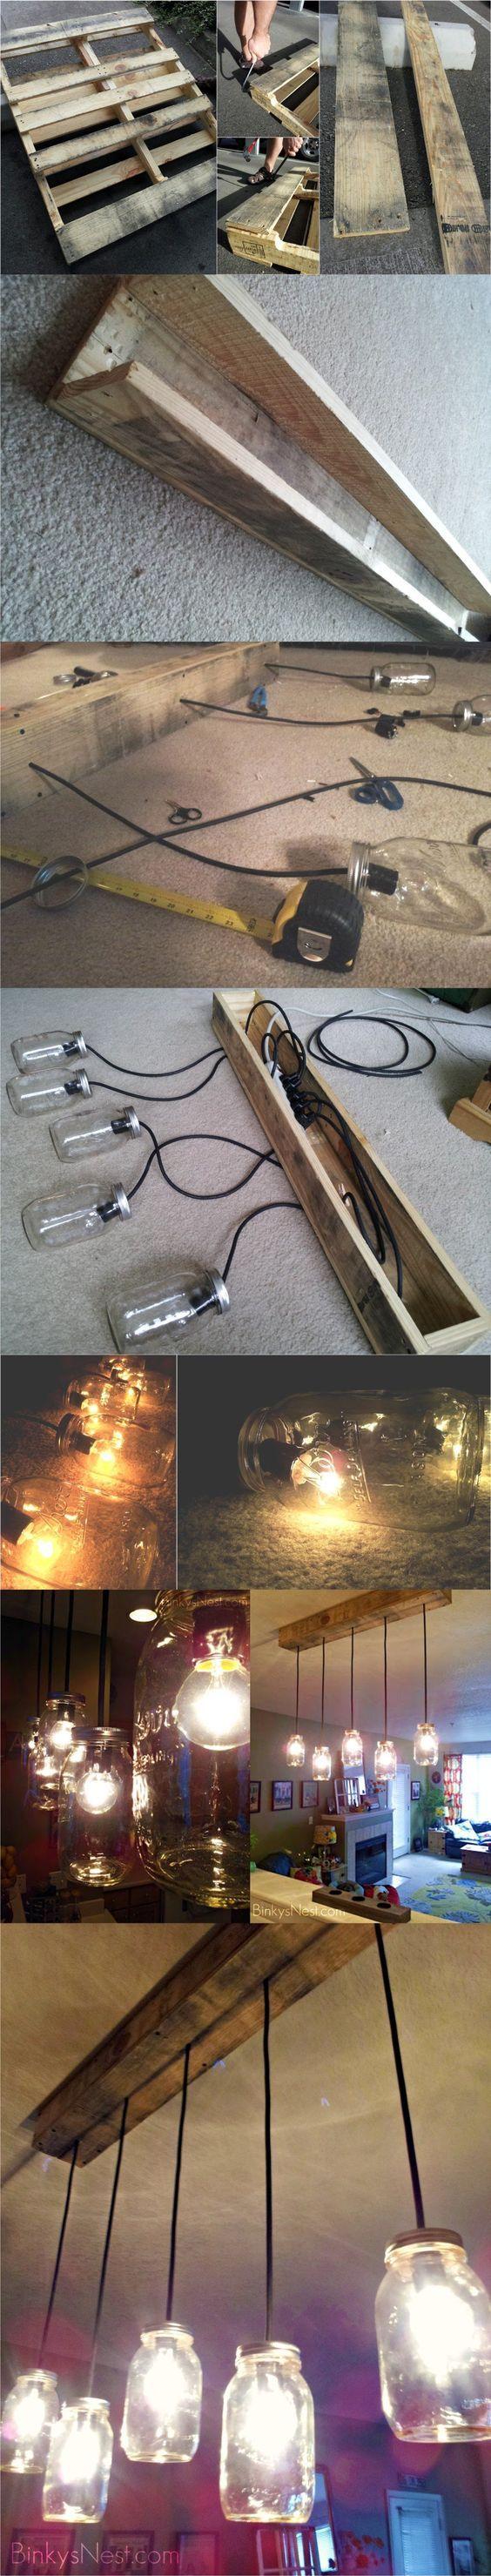 twenty8divine.com - Mason Jar & Rustic Pallet Light Fixture - Lámpara DIY de aspecto rústico